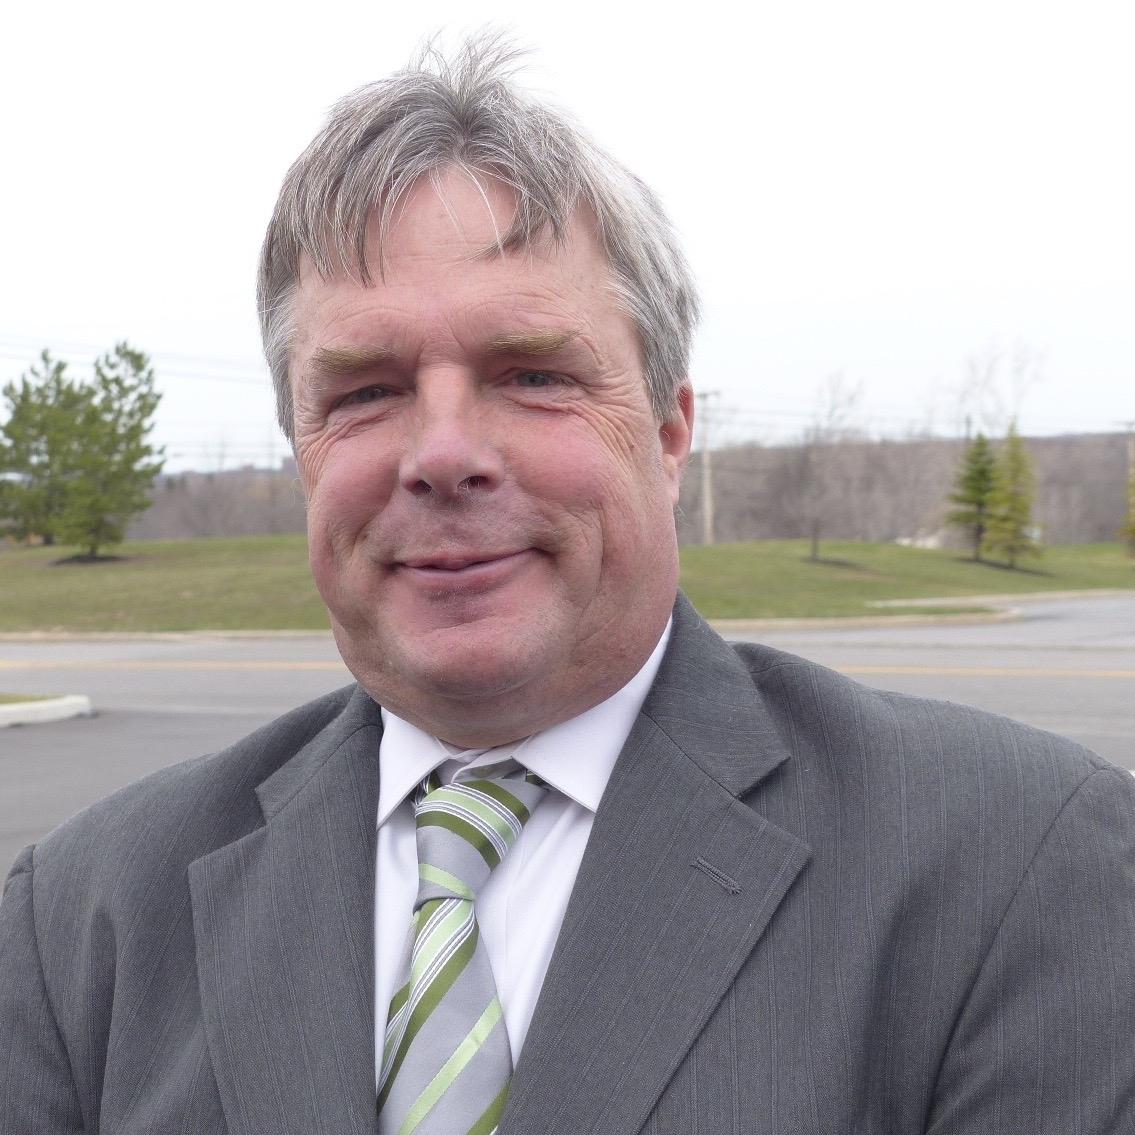 Mike Stafford for Henrietta Town Board